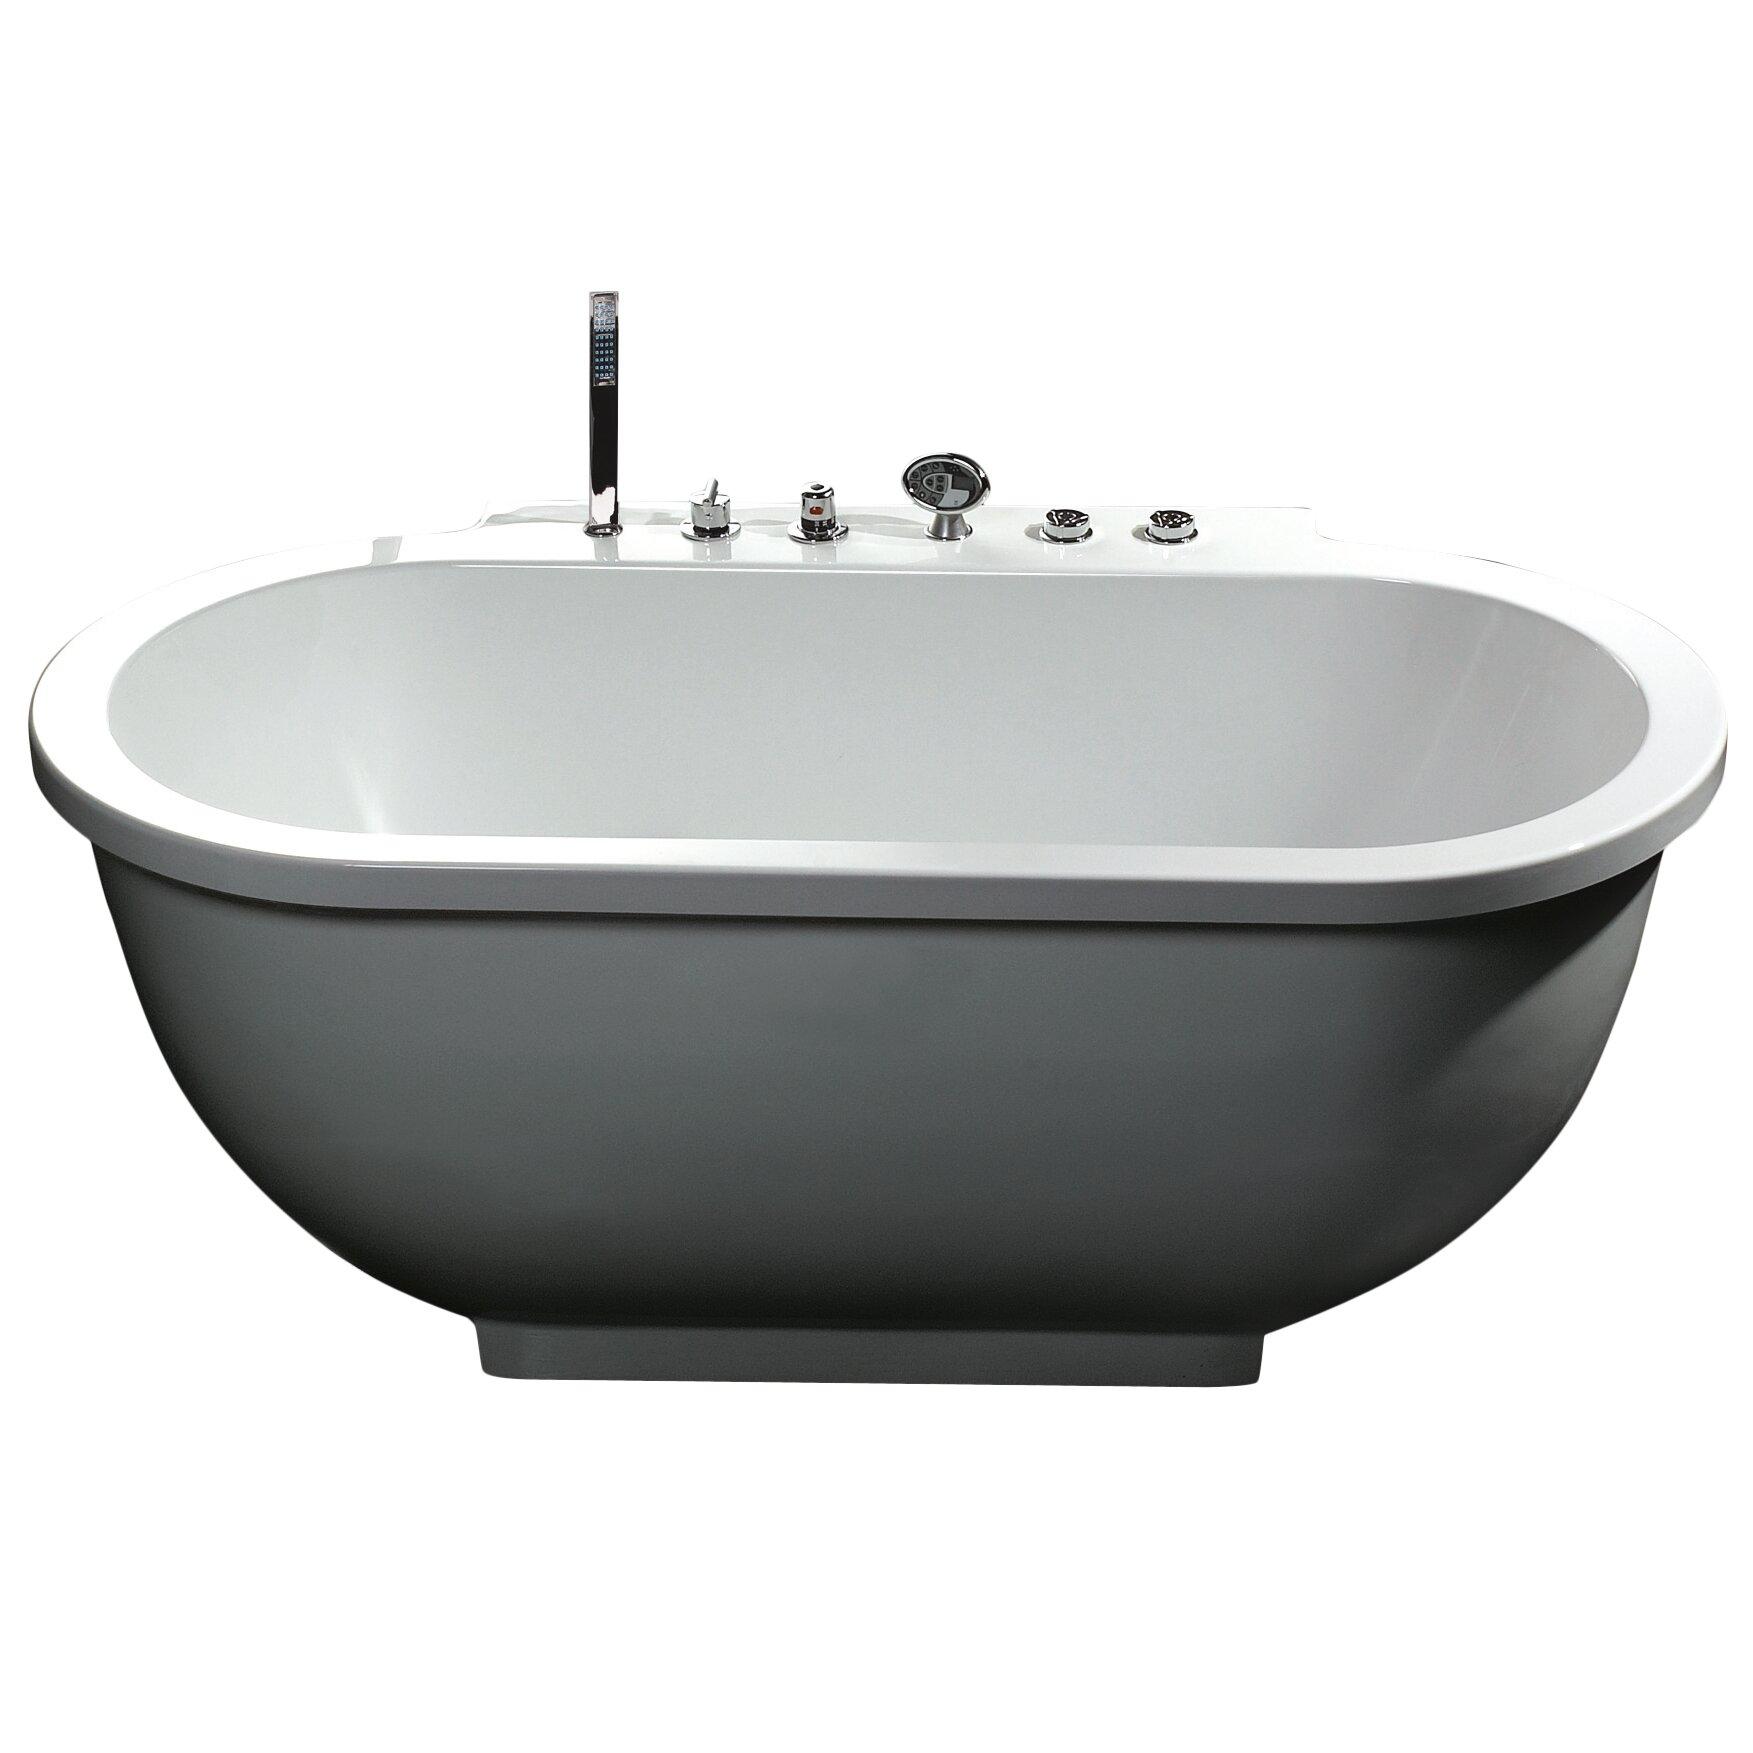 Ariel Bath 71 X 37 Whirlpool Bathtub Reviews Wayfair